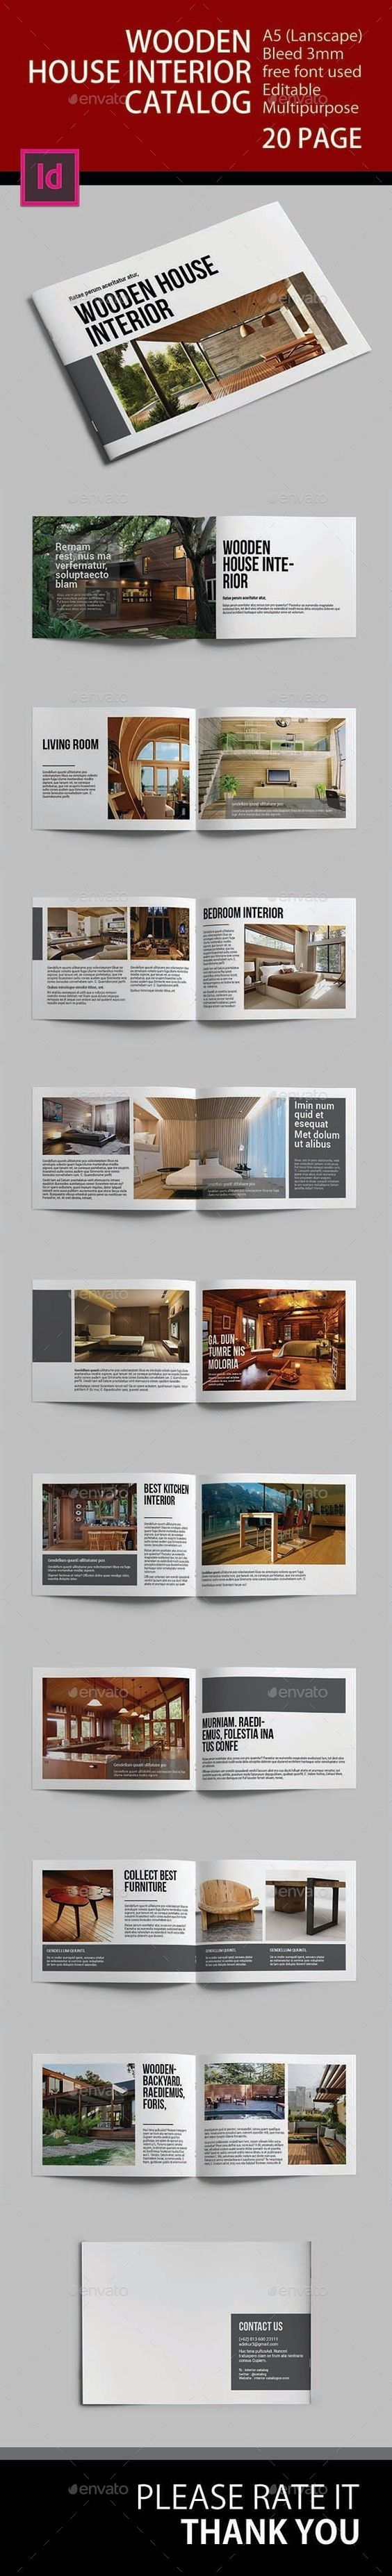 House Interior Catalog   The photo, House and Design